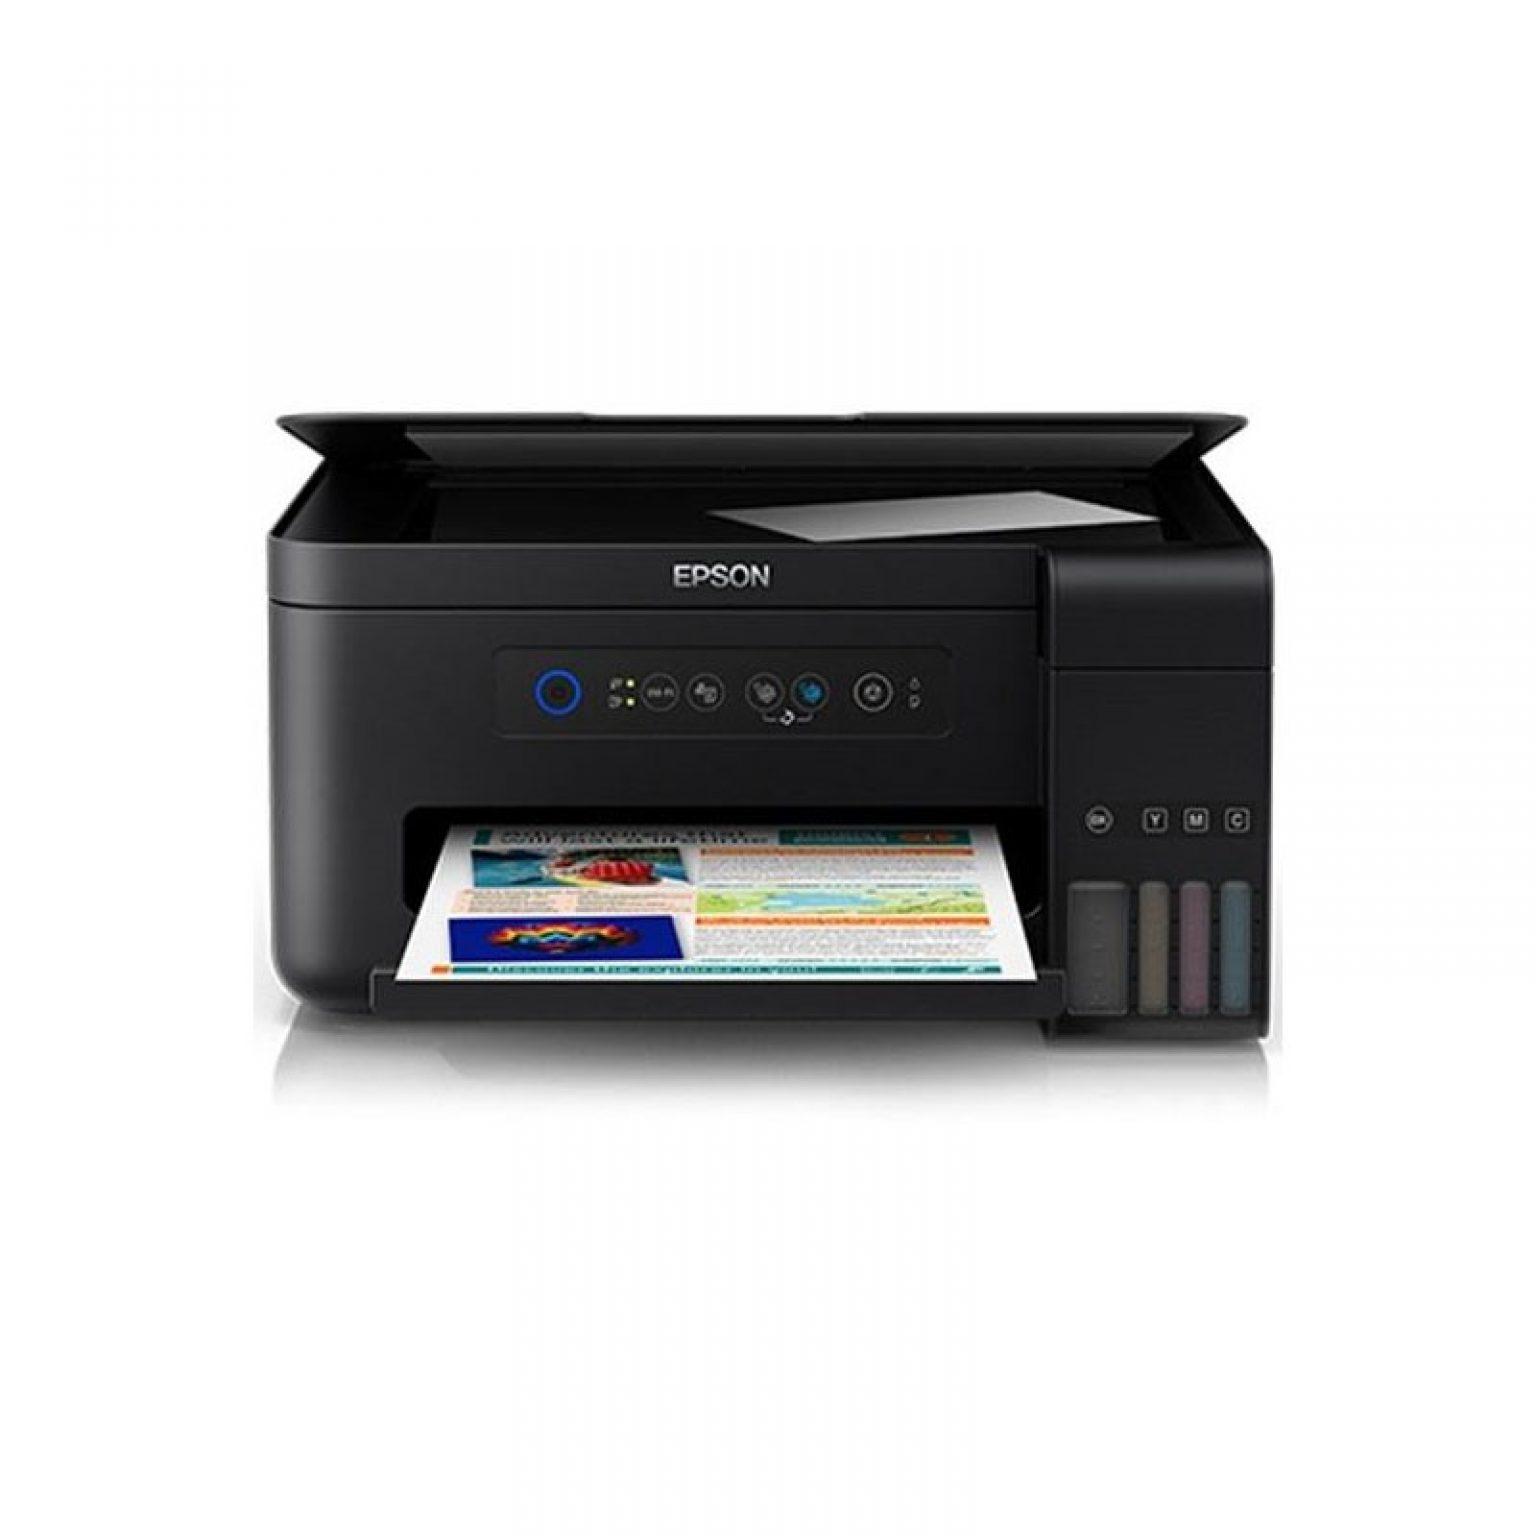 EPSON - Printer L4150